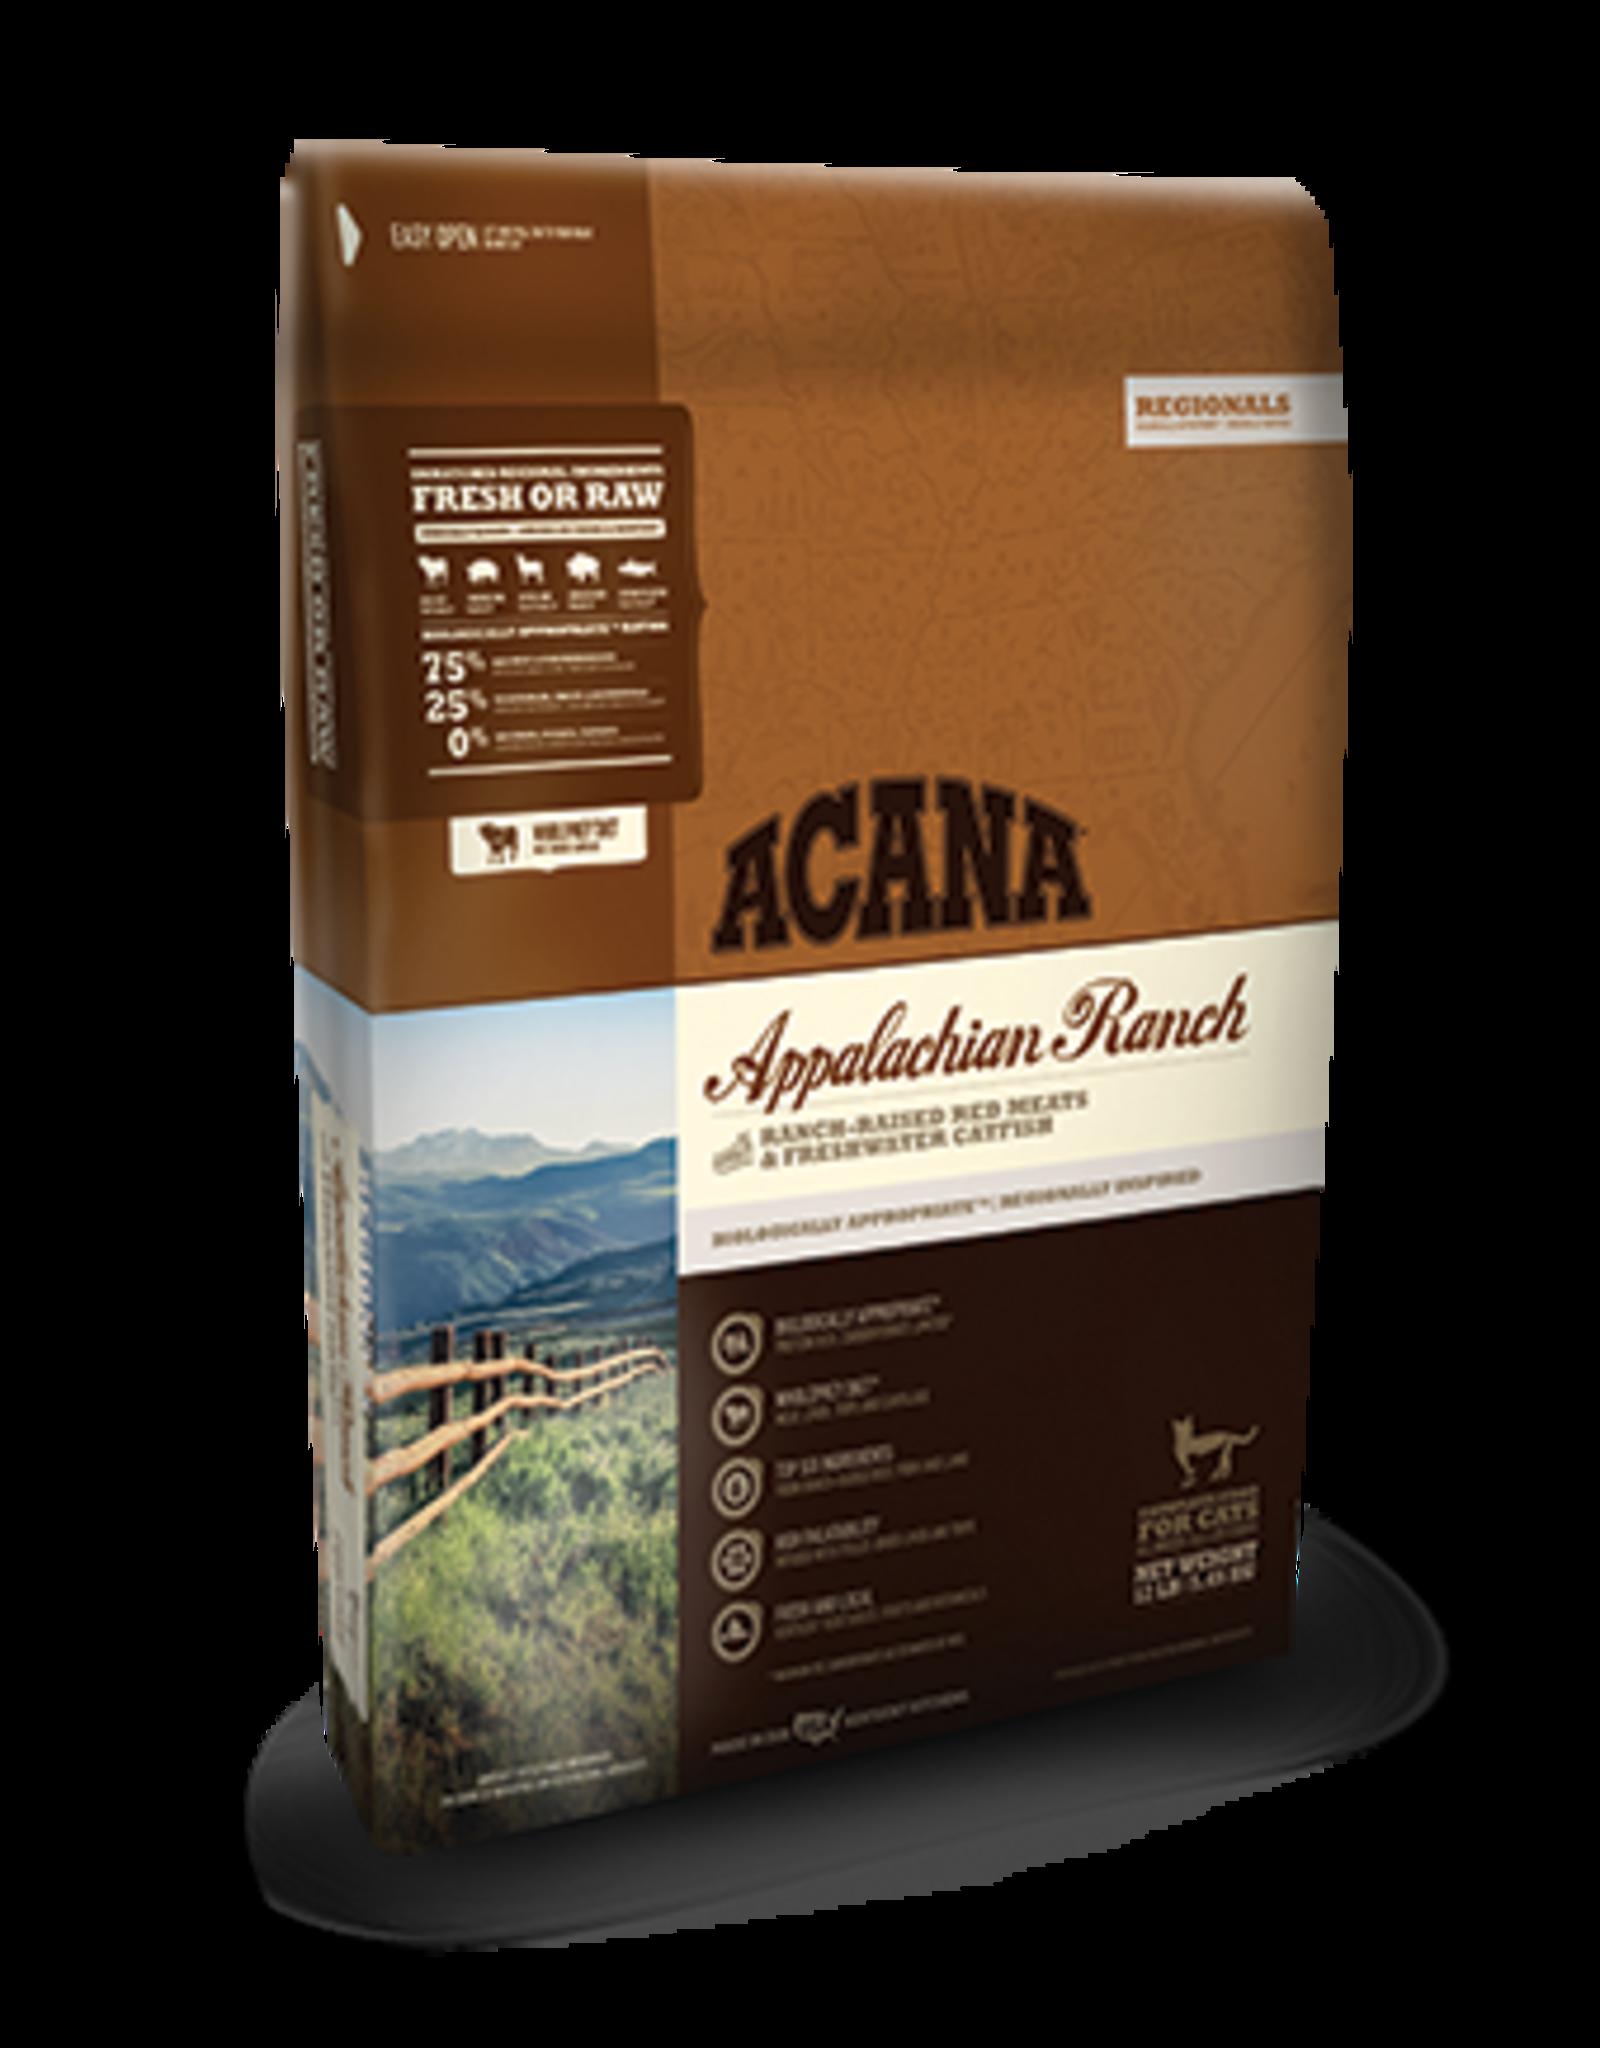 Acana Acana Cat Food Appalachian Ranch